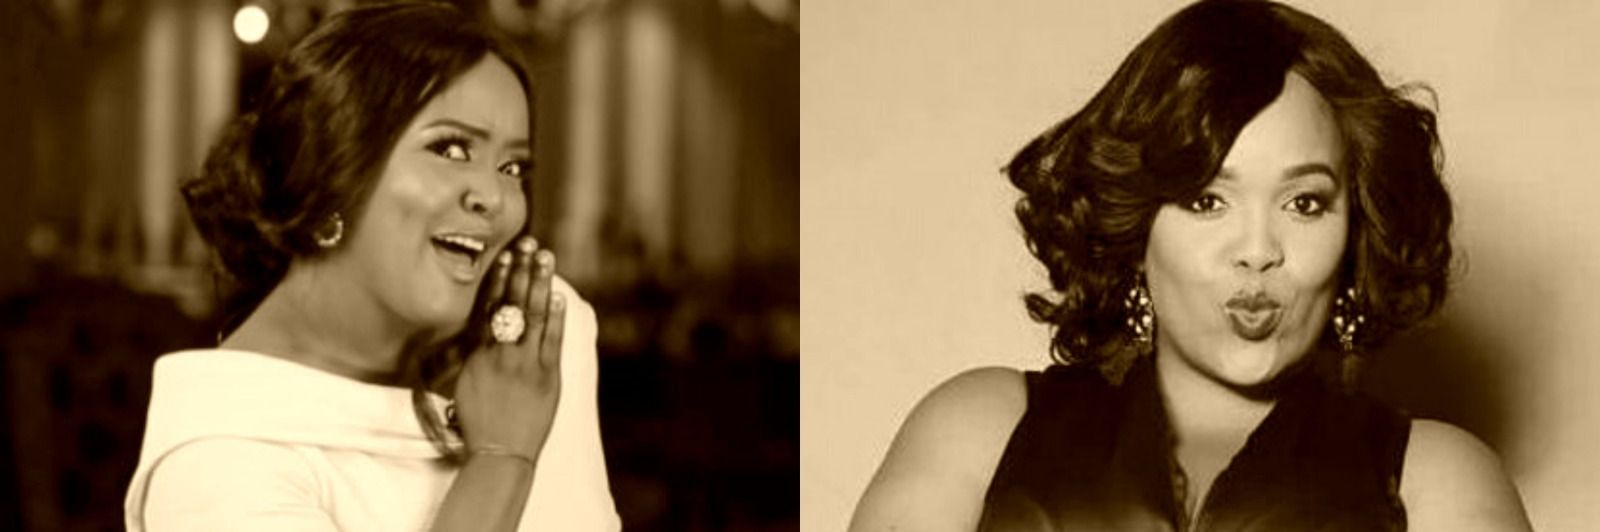 Africa Magic Official Website - Naija's Helen Paul & SA's